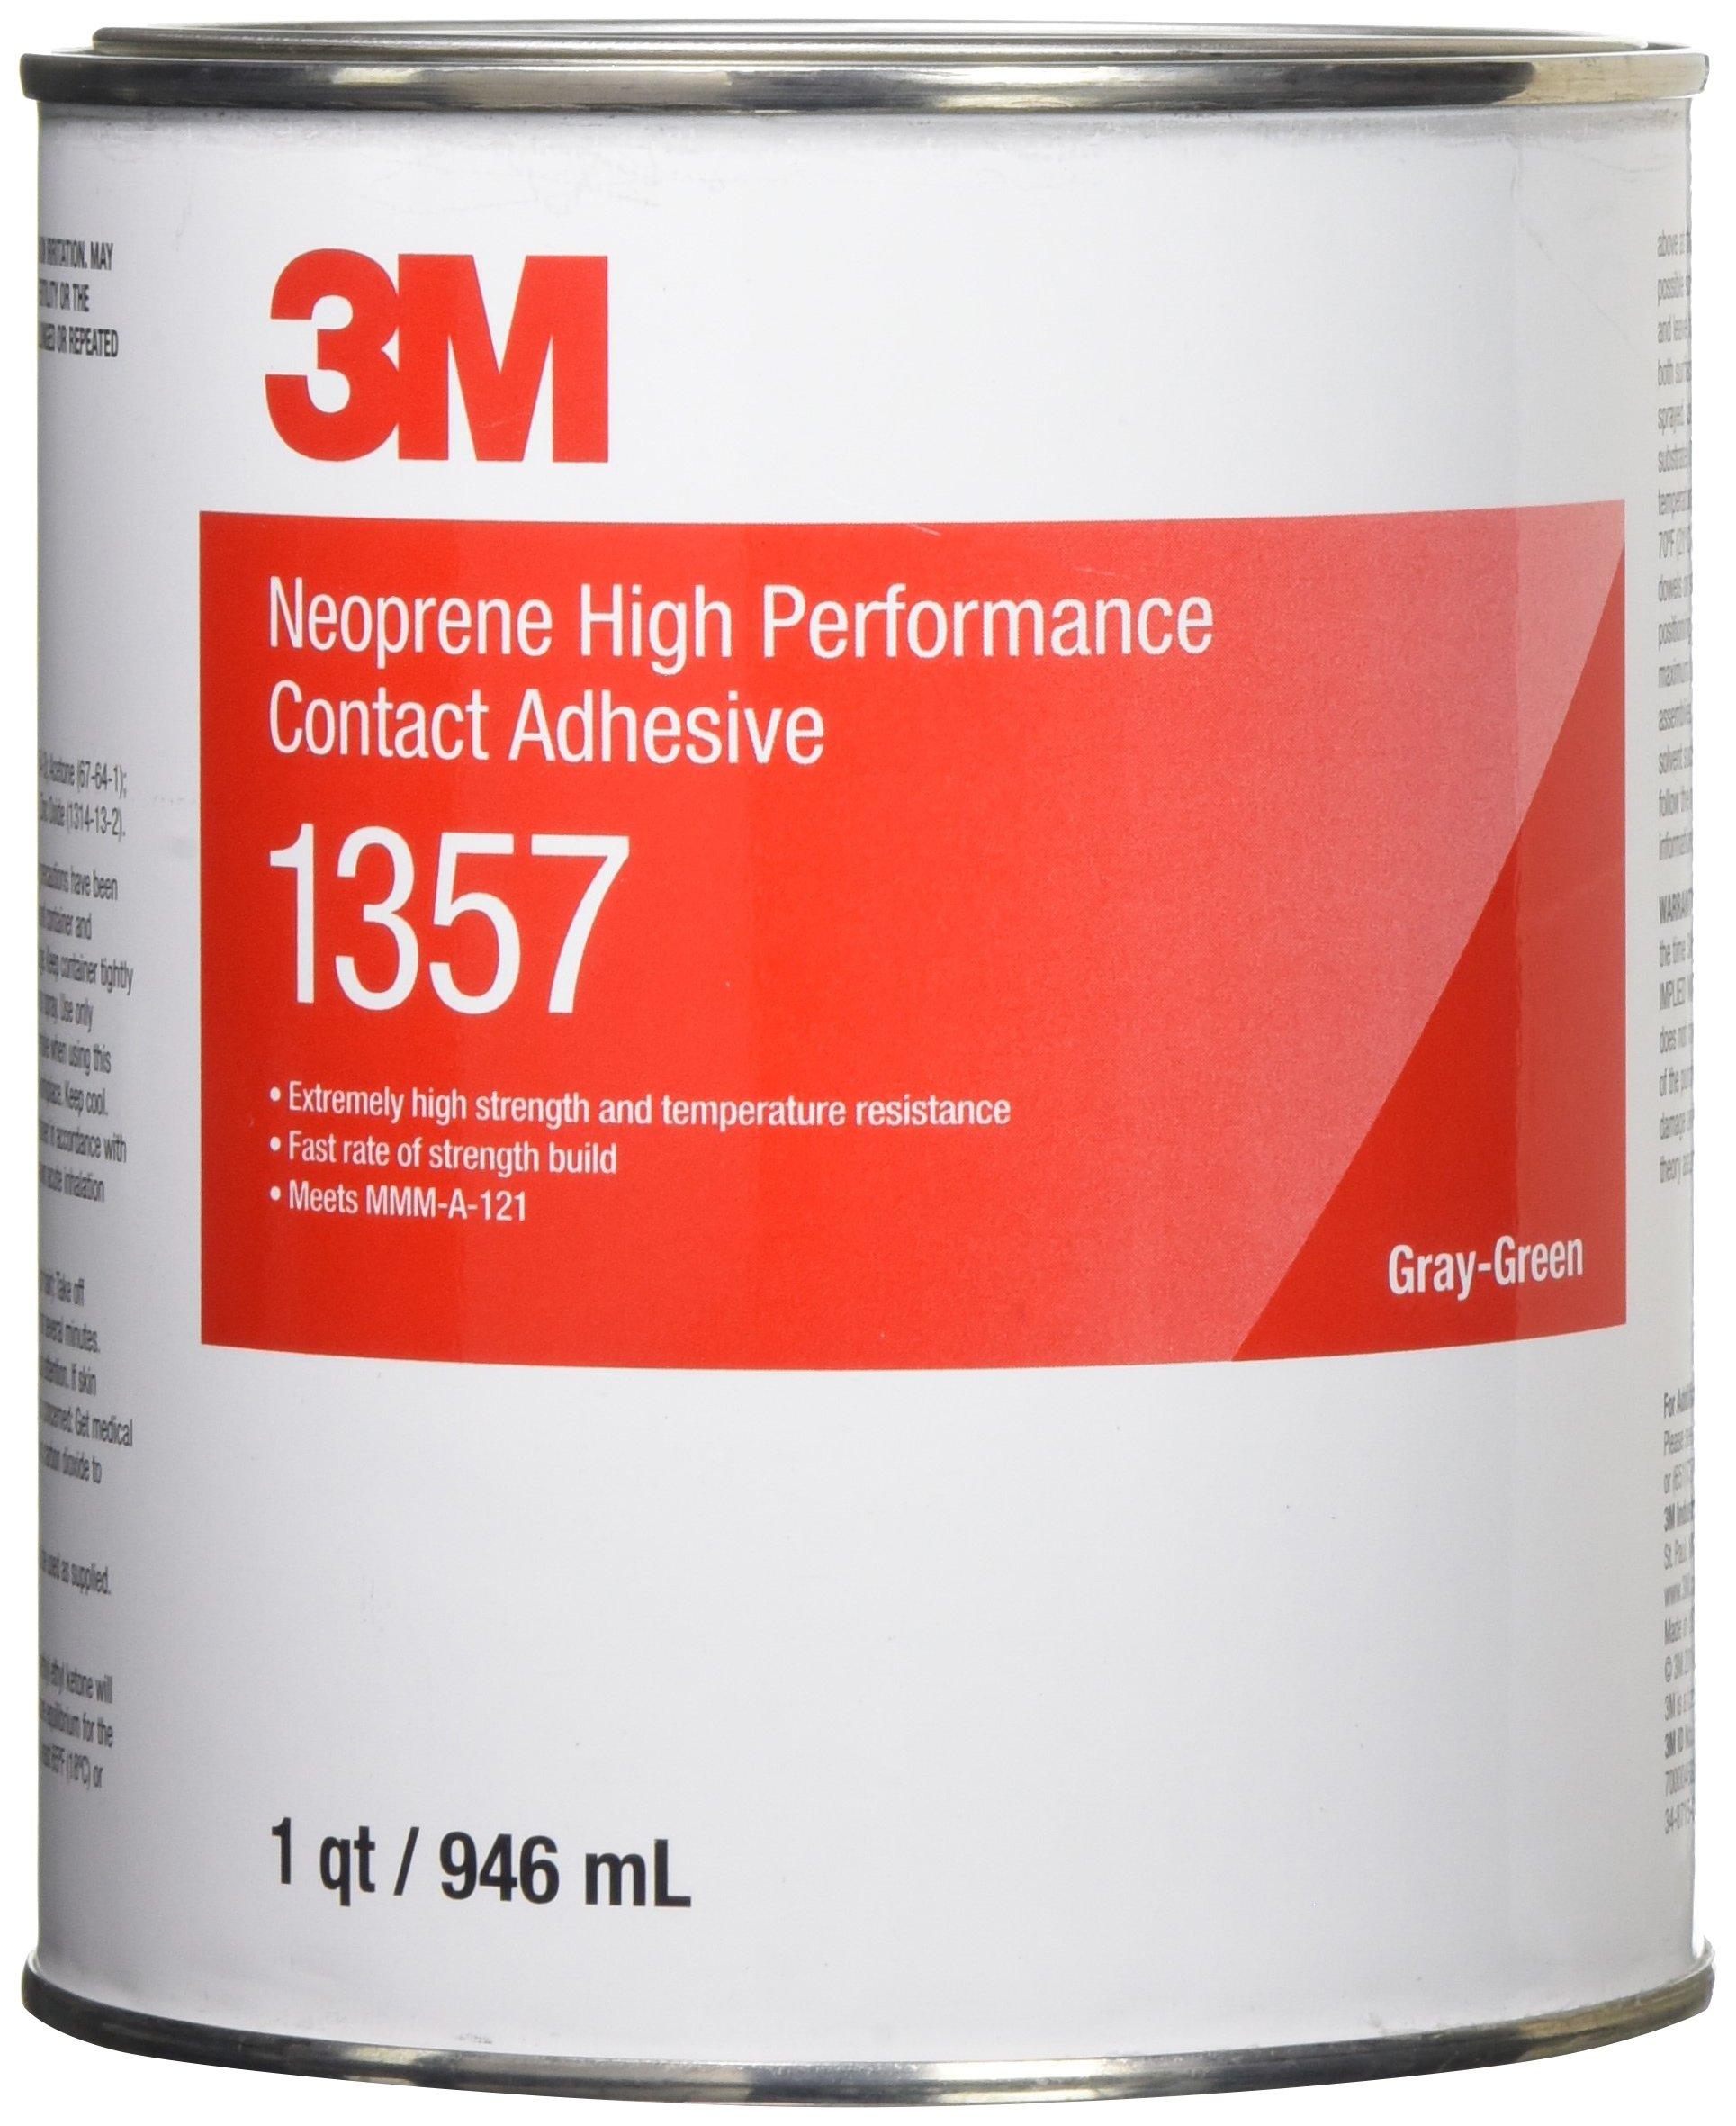 3M(TM) Neoprene High Performance Contact Adhesive 1357 Gray-Green, 1 Quart